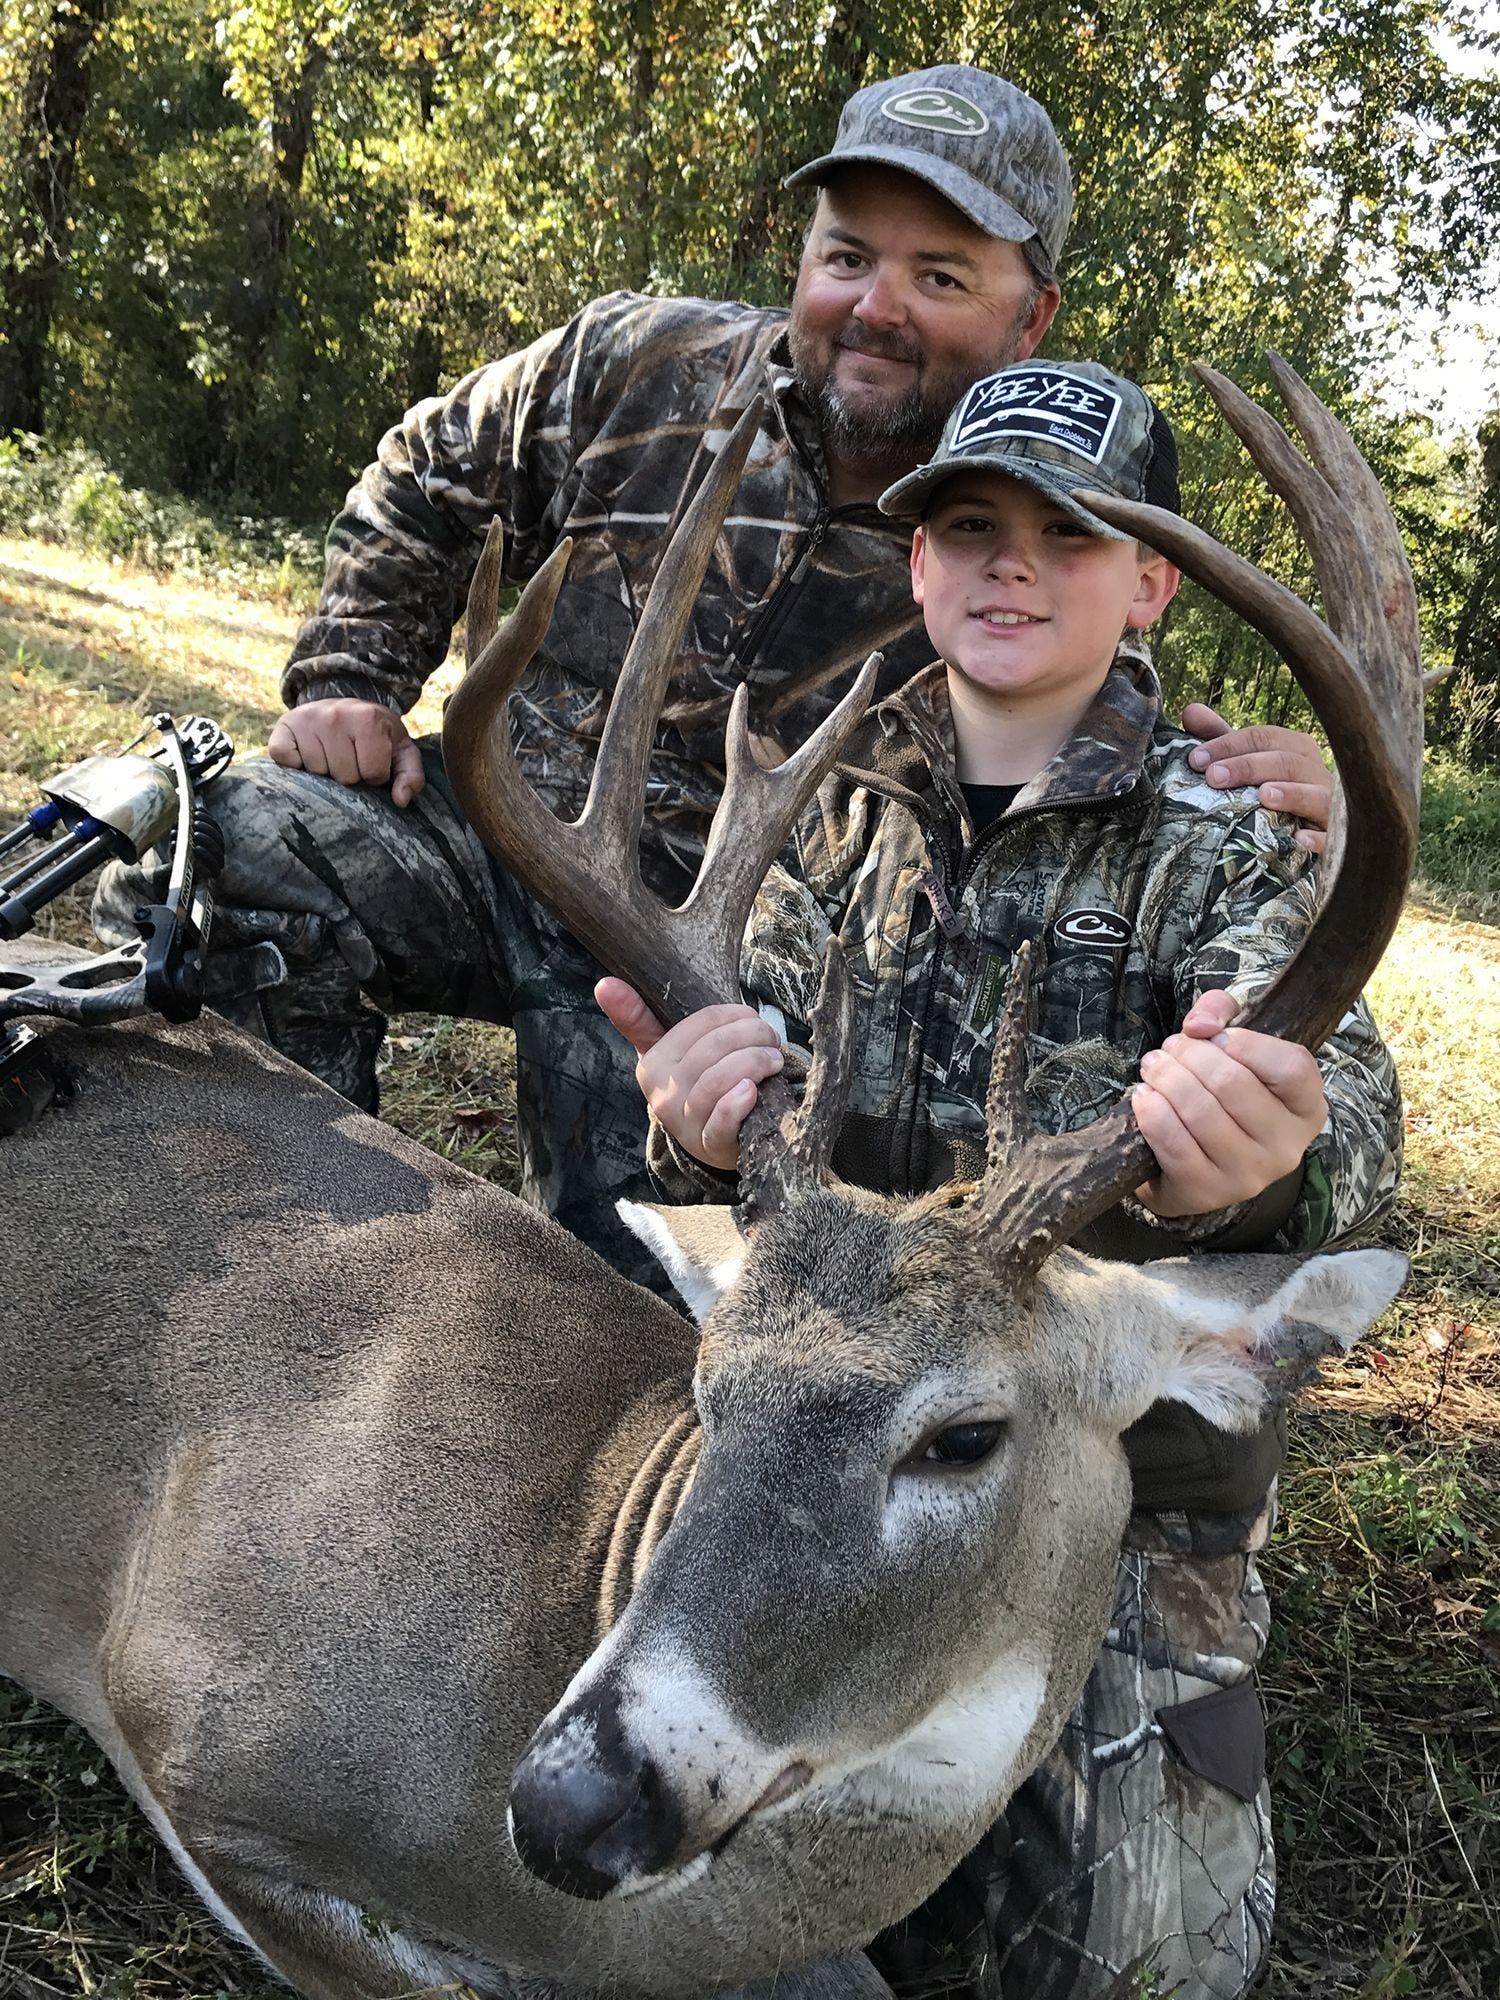 2020 Deer Hunting Calendar Trophy Bucks Whitetail Bow throughout Deer Hunting Calendar 2020